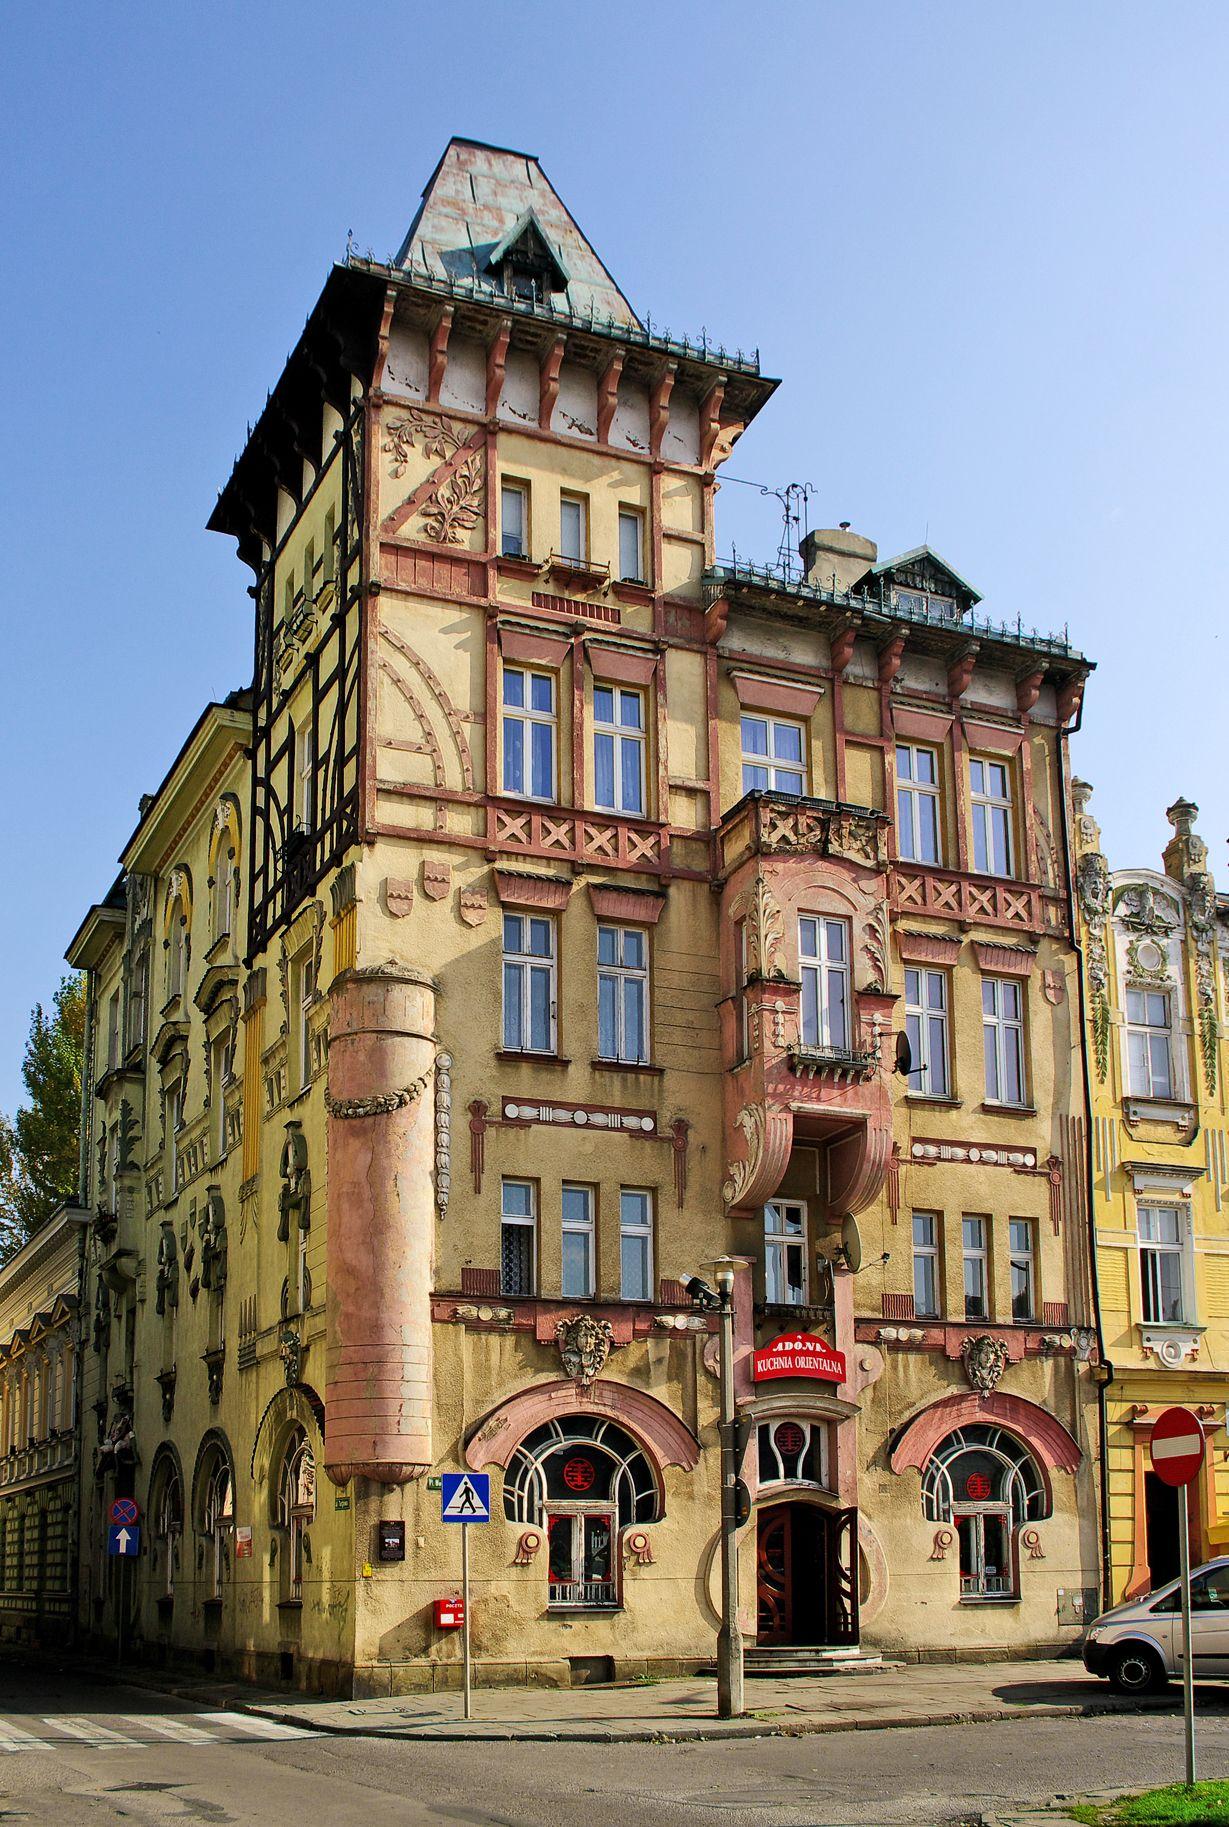 Secesja Kamienica Pod Zabami Bielsko Biala 1903 Poland Cities Poland Poland Travel